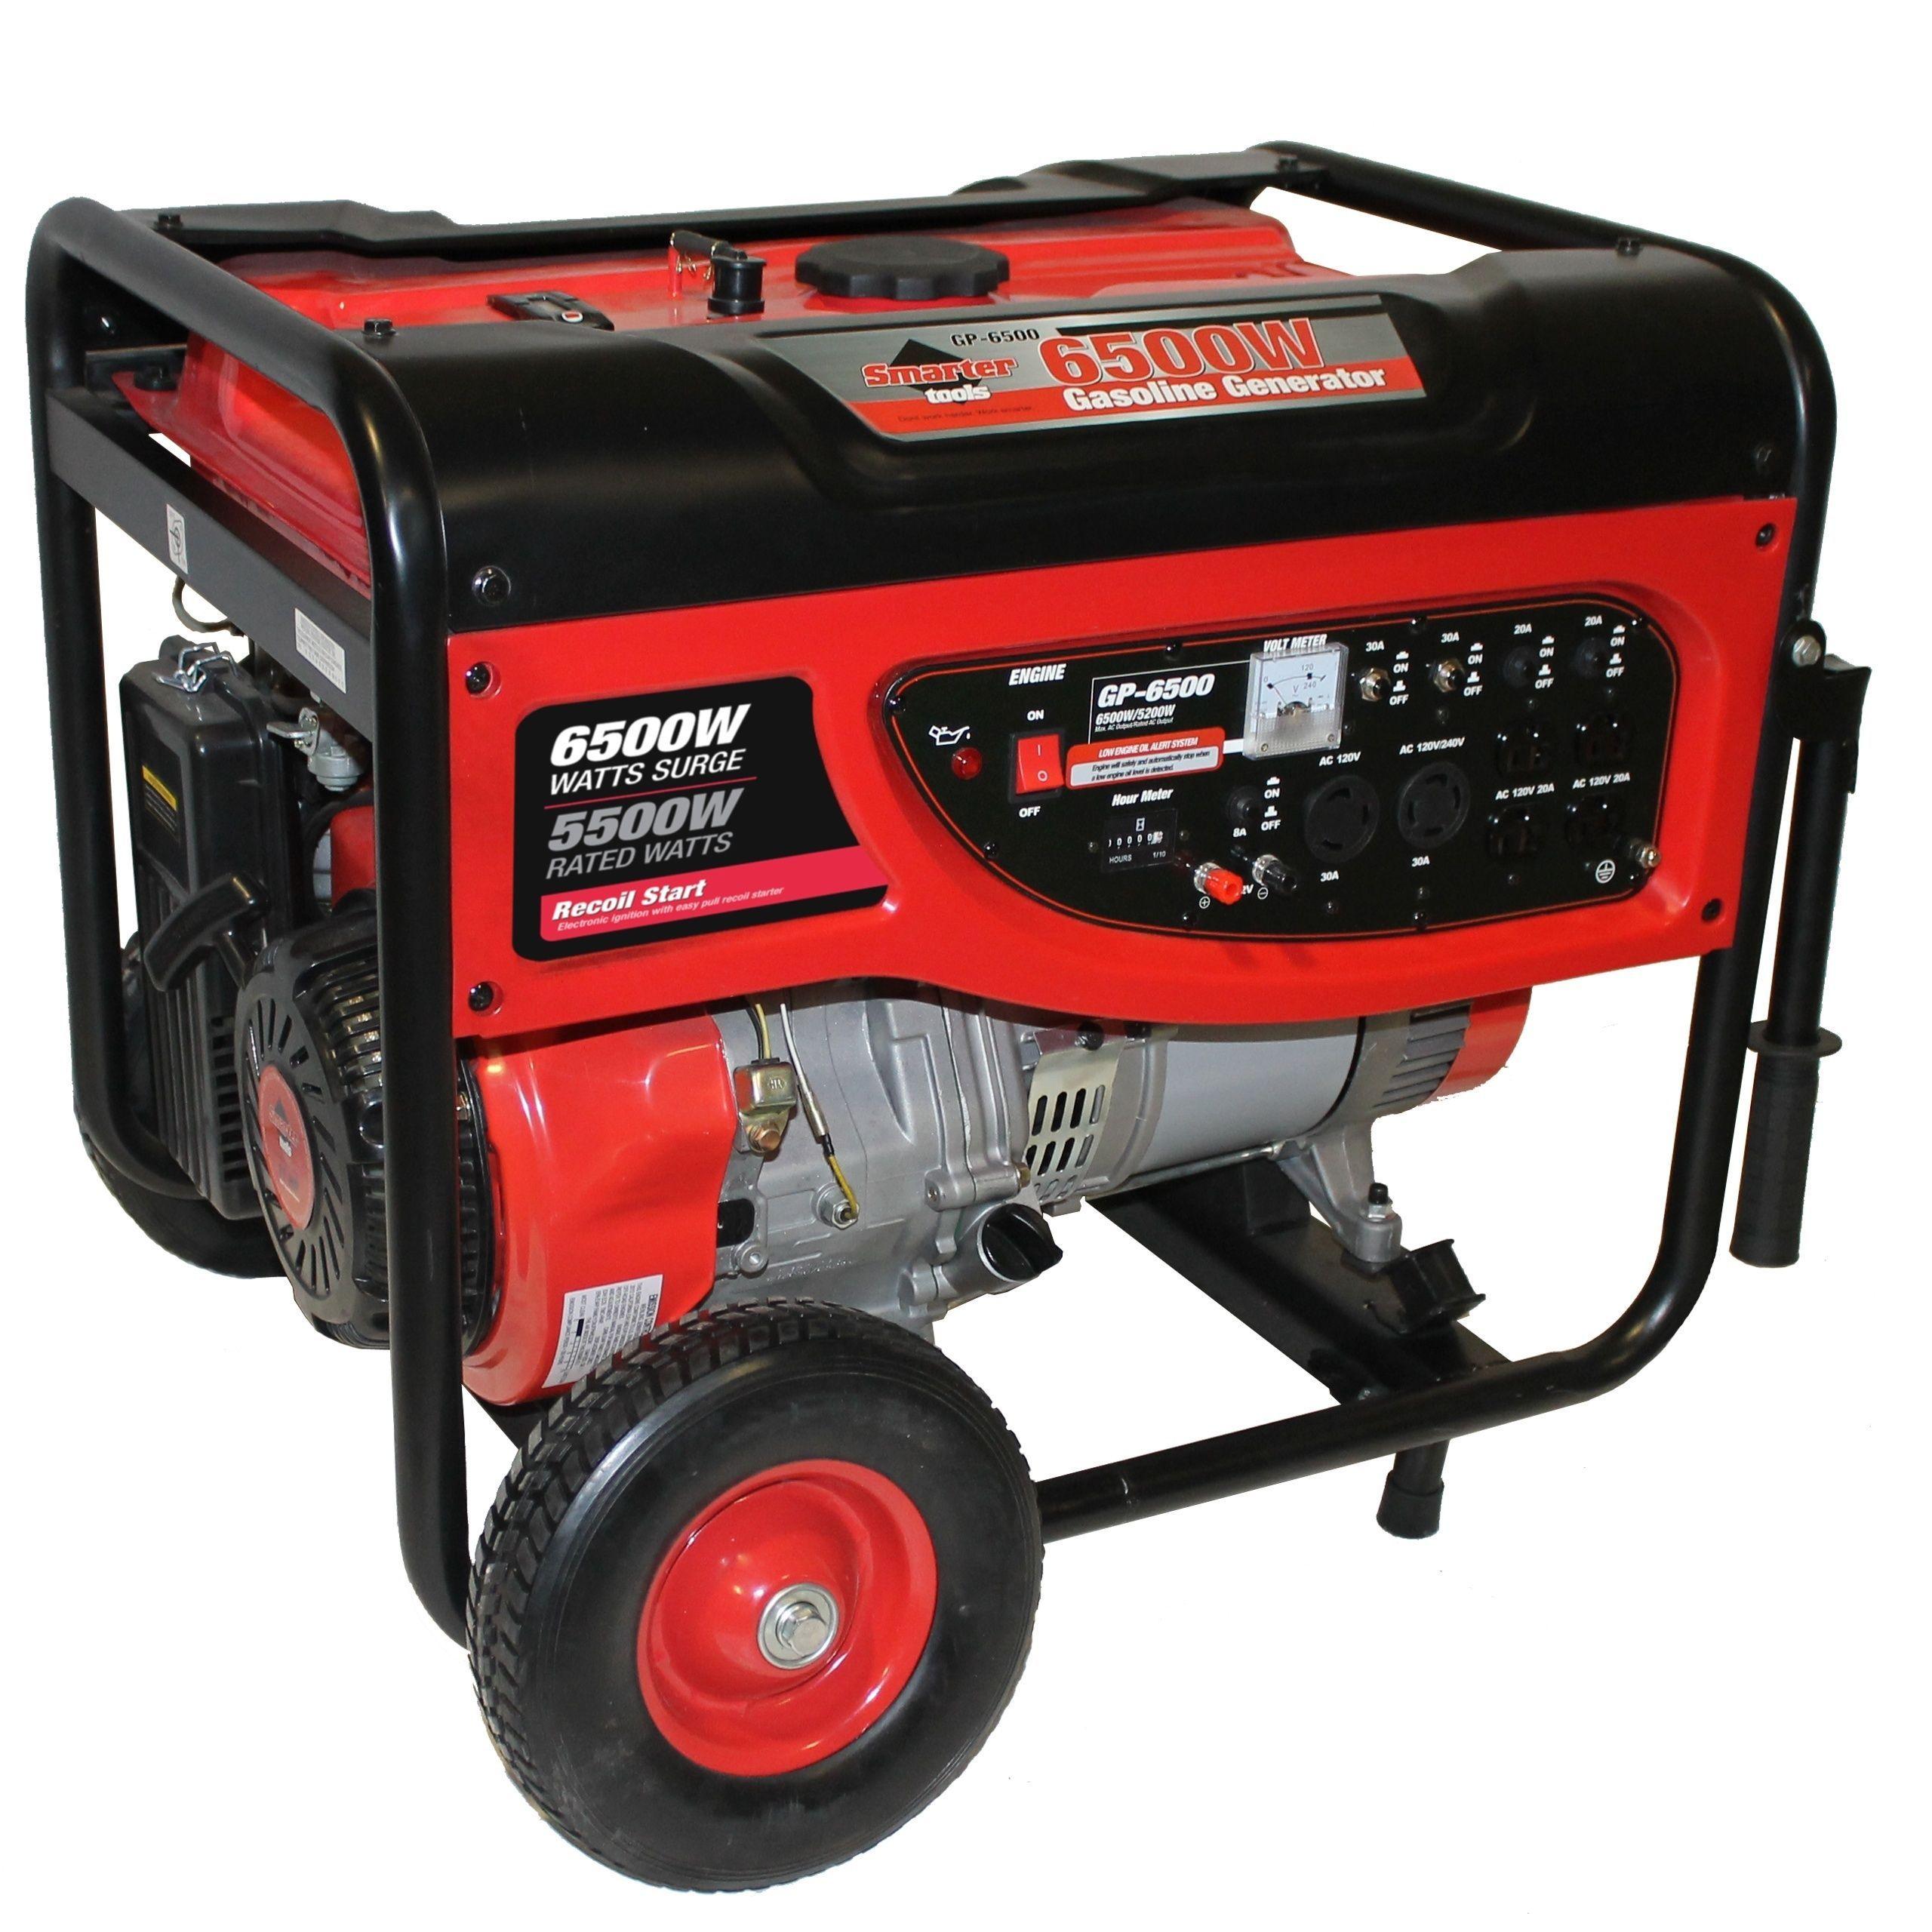 Smarter Tools 6500 watt Portable Gas Generator with No Flat Wheels